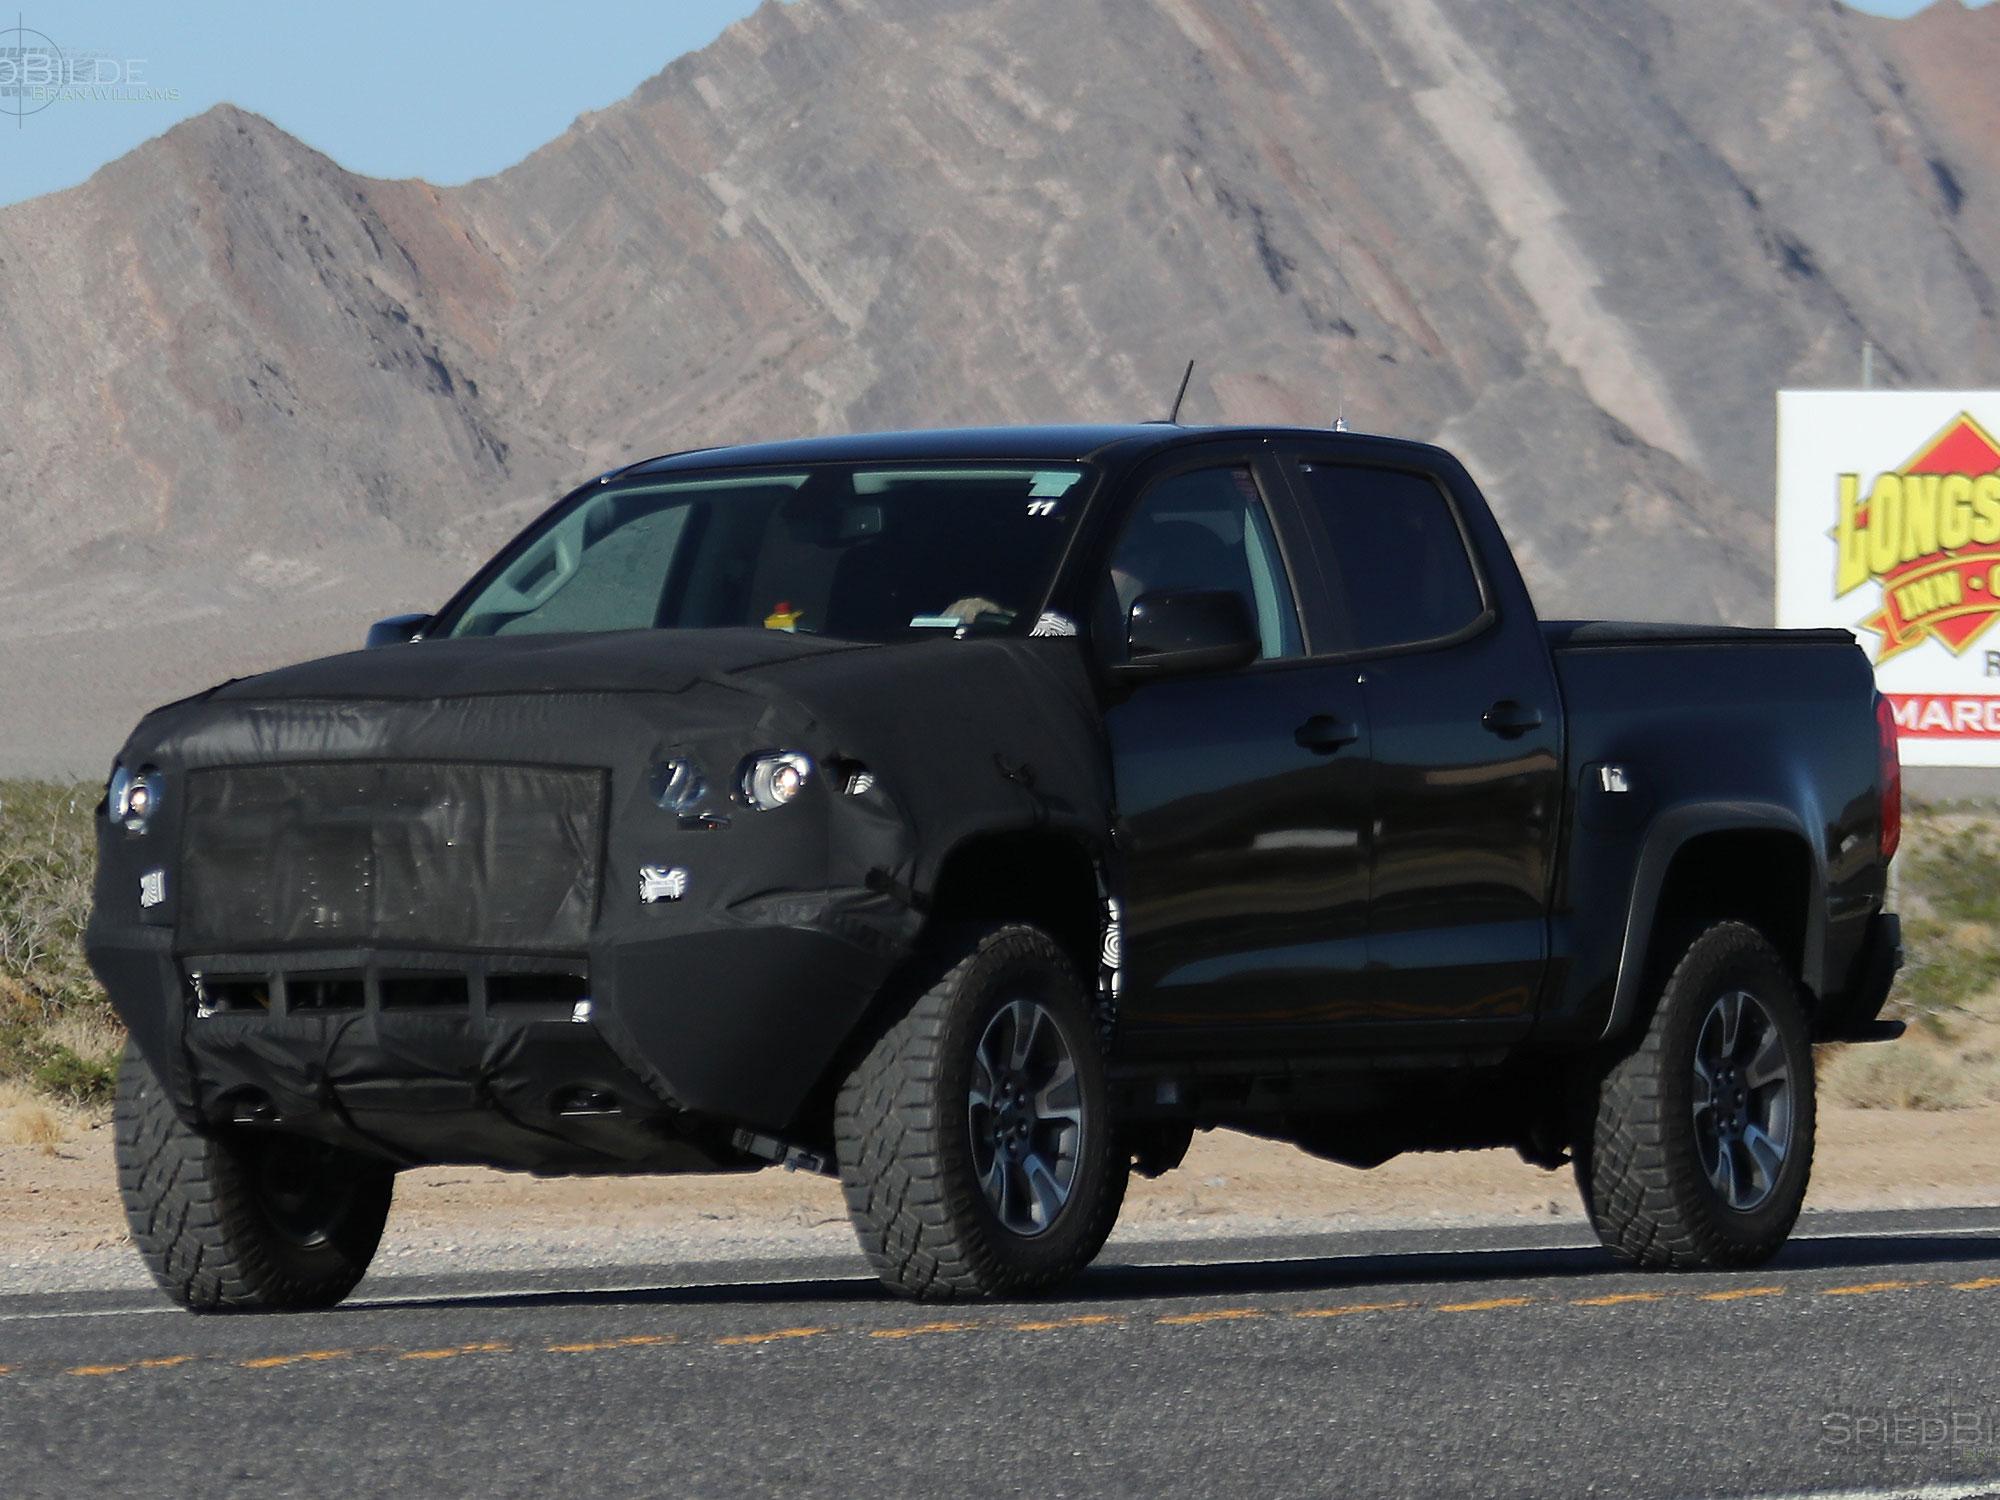 Spied: A Production-Spec 2013 Chevrolet Colorado Caught